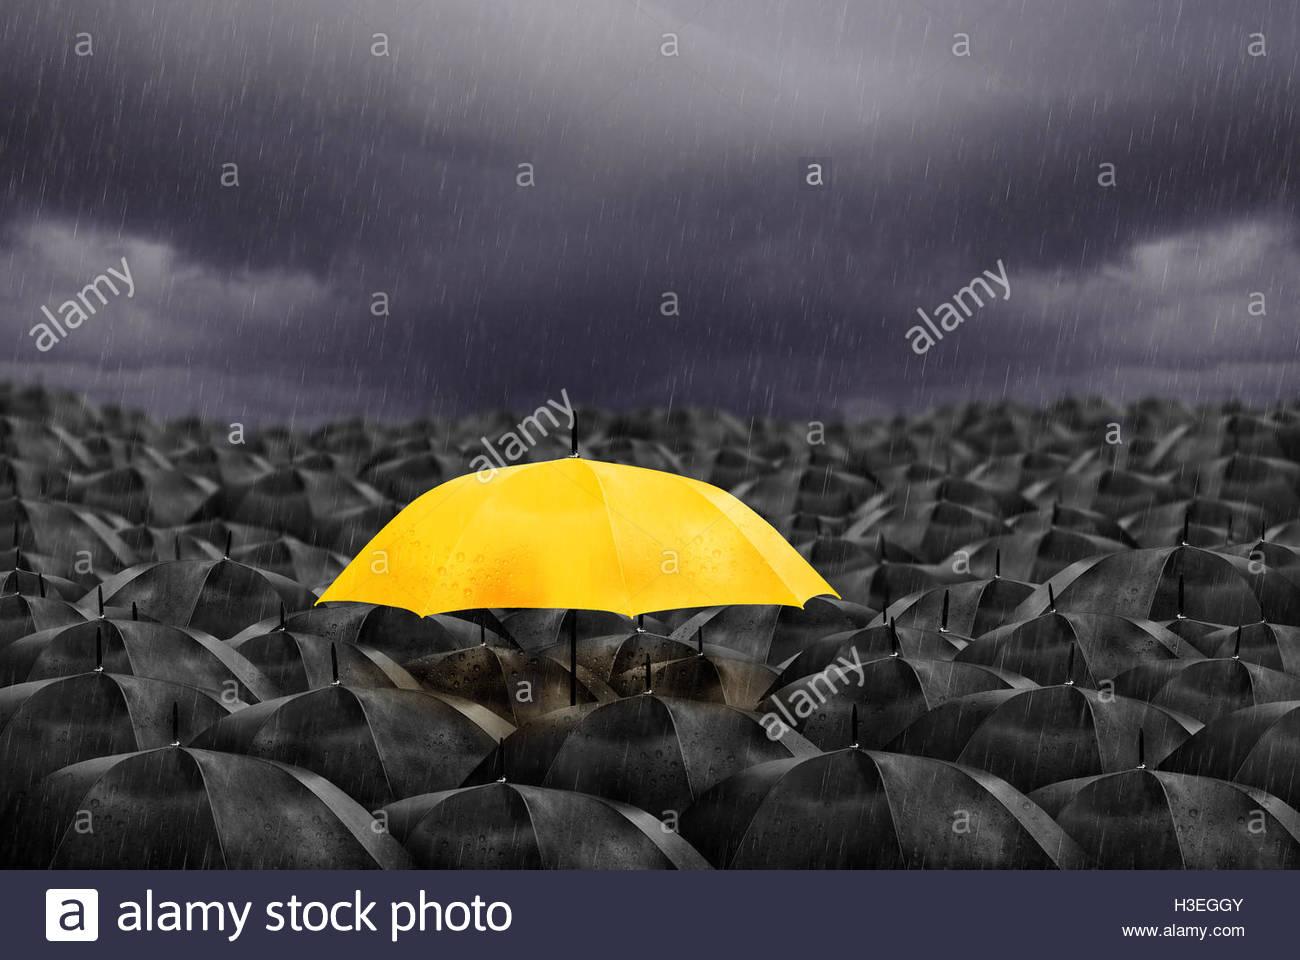 Paraguas amarillo en masa de Paraguas negro. Imagen De Stock